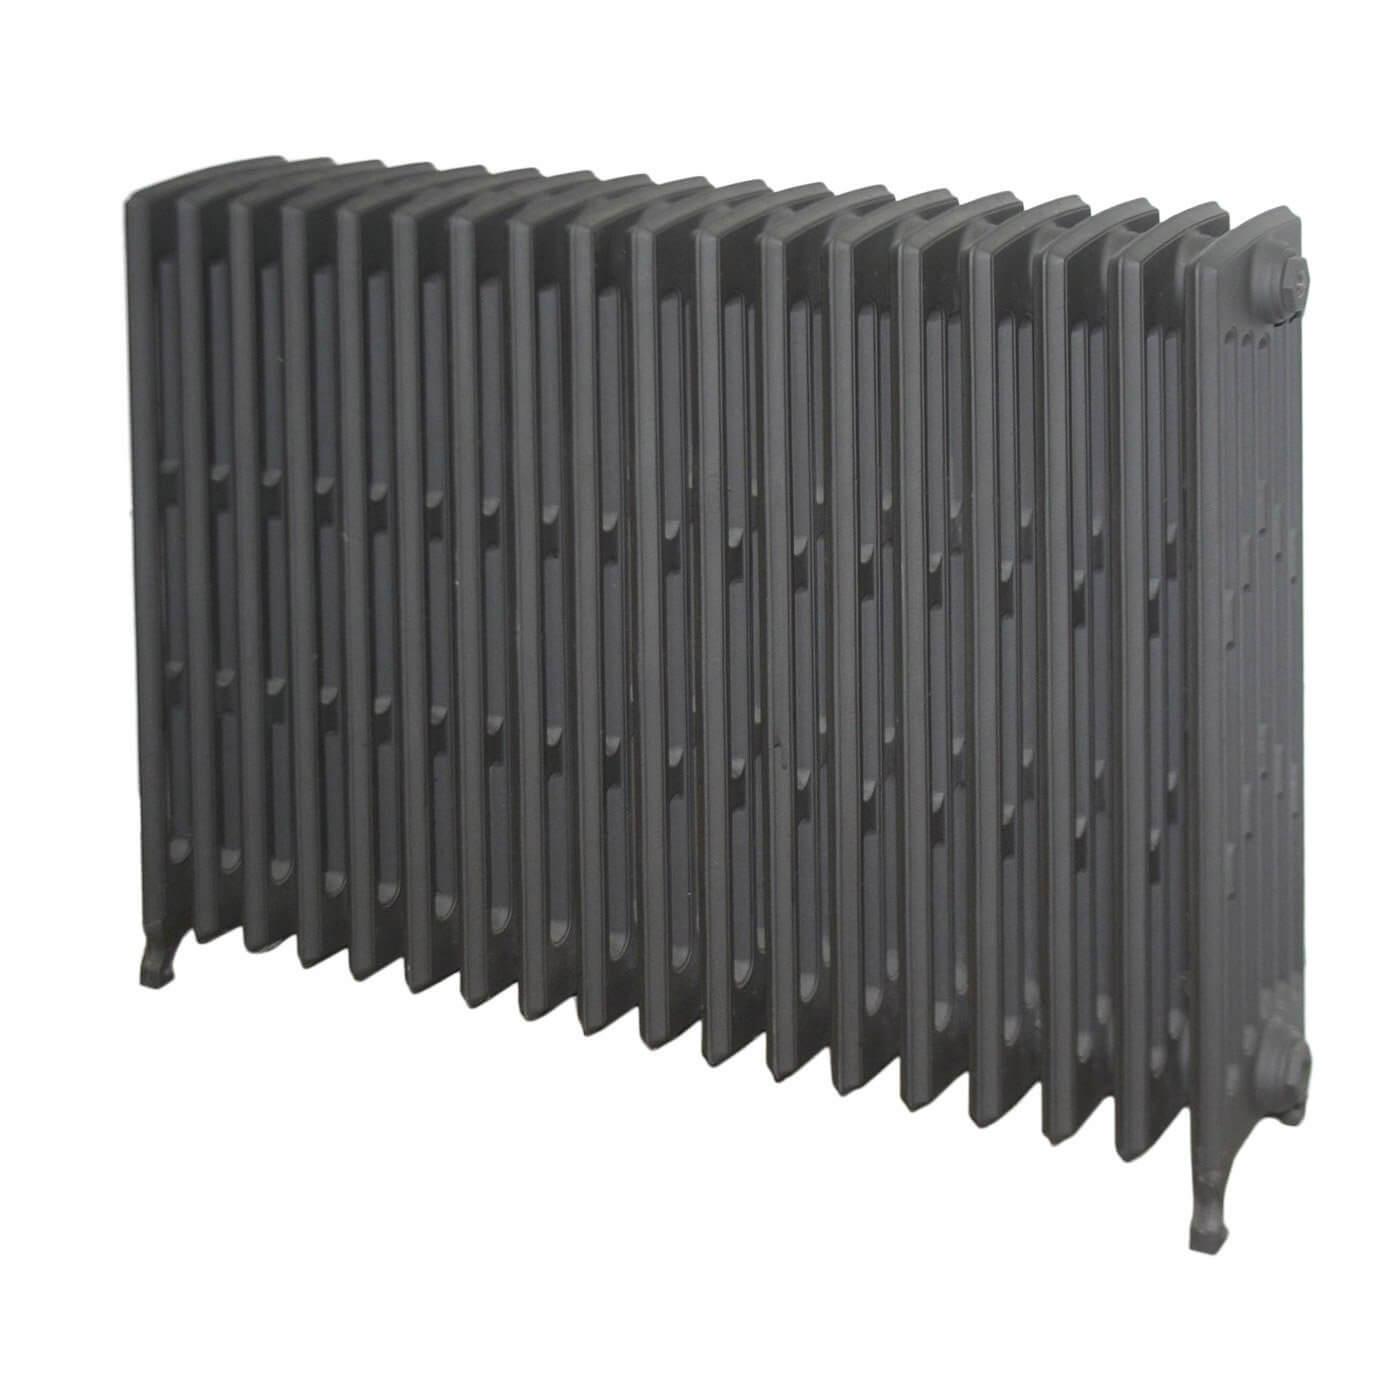 nettoyer radiateur en fonte nettoyer radiateur electrique. Black Bedroom Furniture Sets. Home Design Ideas